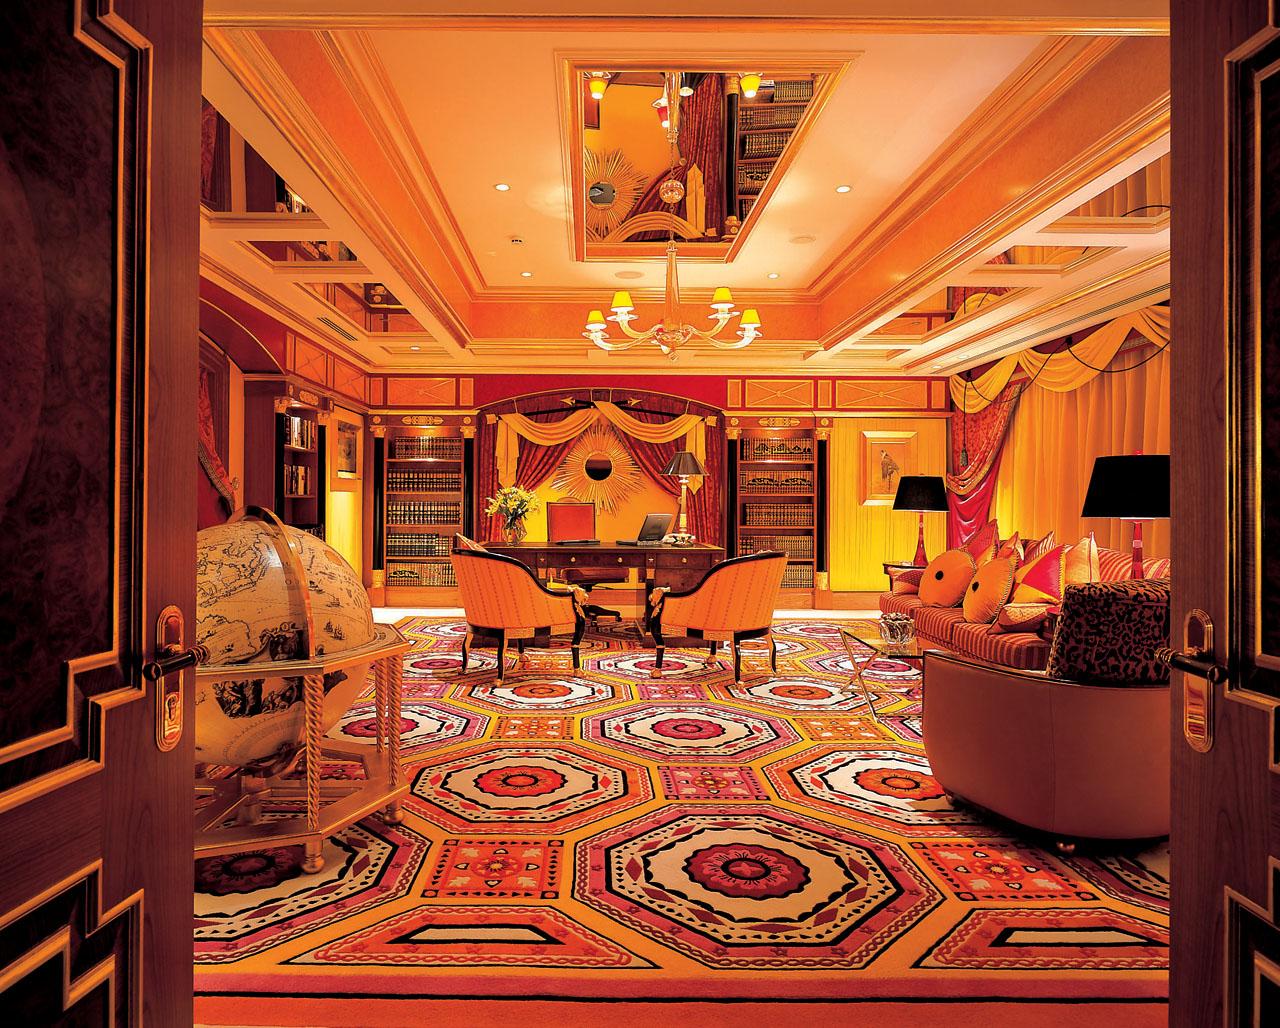 Hotel_Royal_Suite_Burj_Al_Arab_Dubai_02  |Burj Arab Hotel Rooms